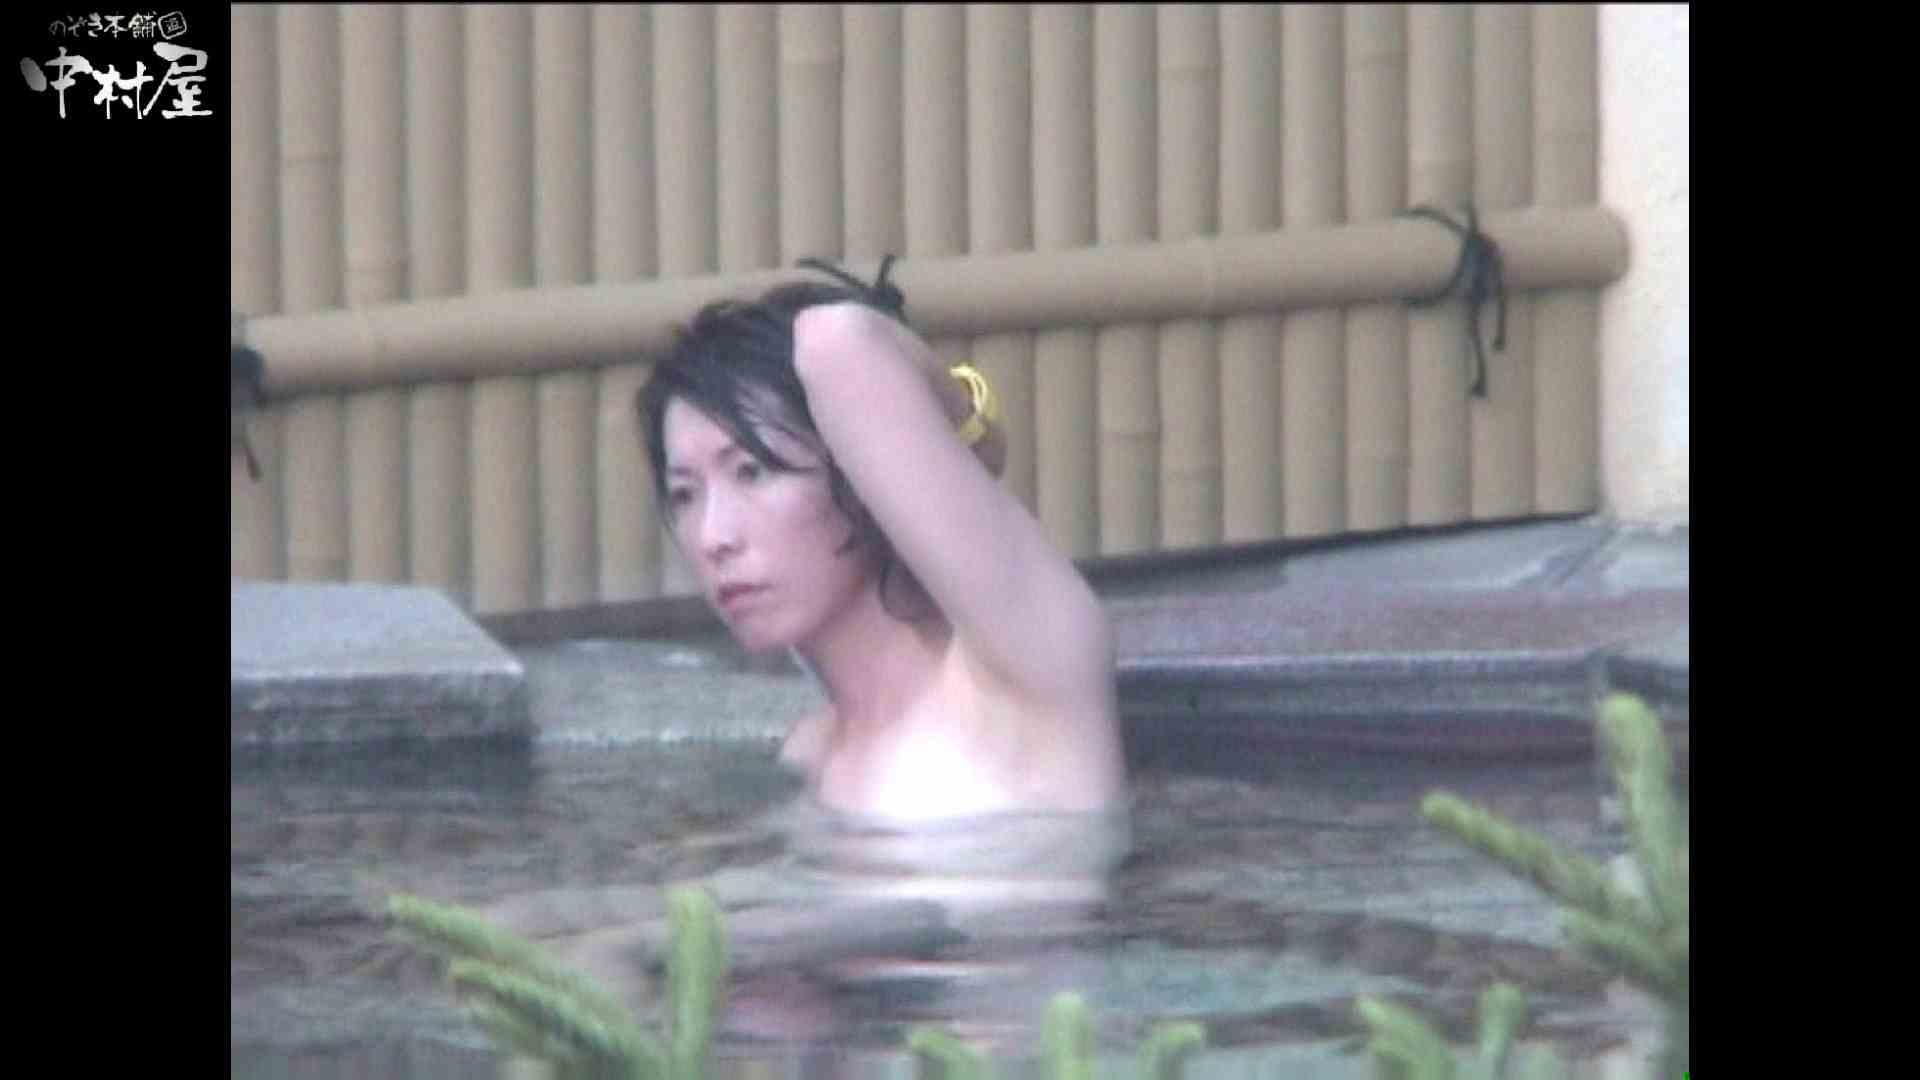 Aquaな露天風呂Vol.987 盗撮シリーズ | 露天風呂編  88PIX 23